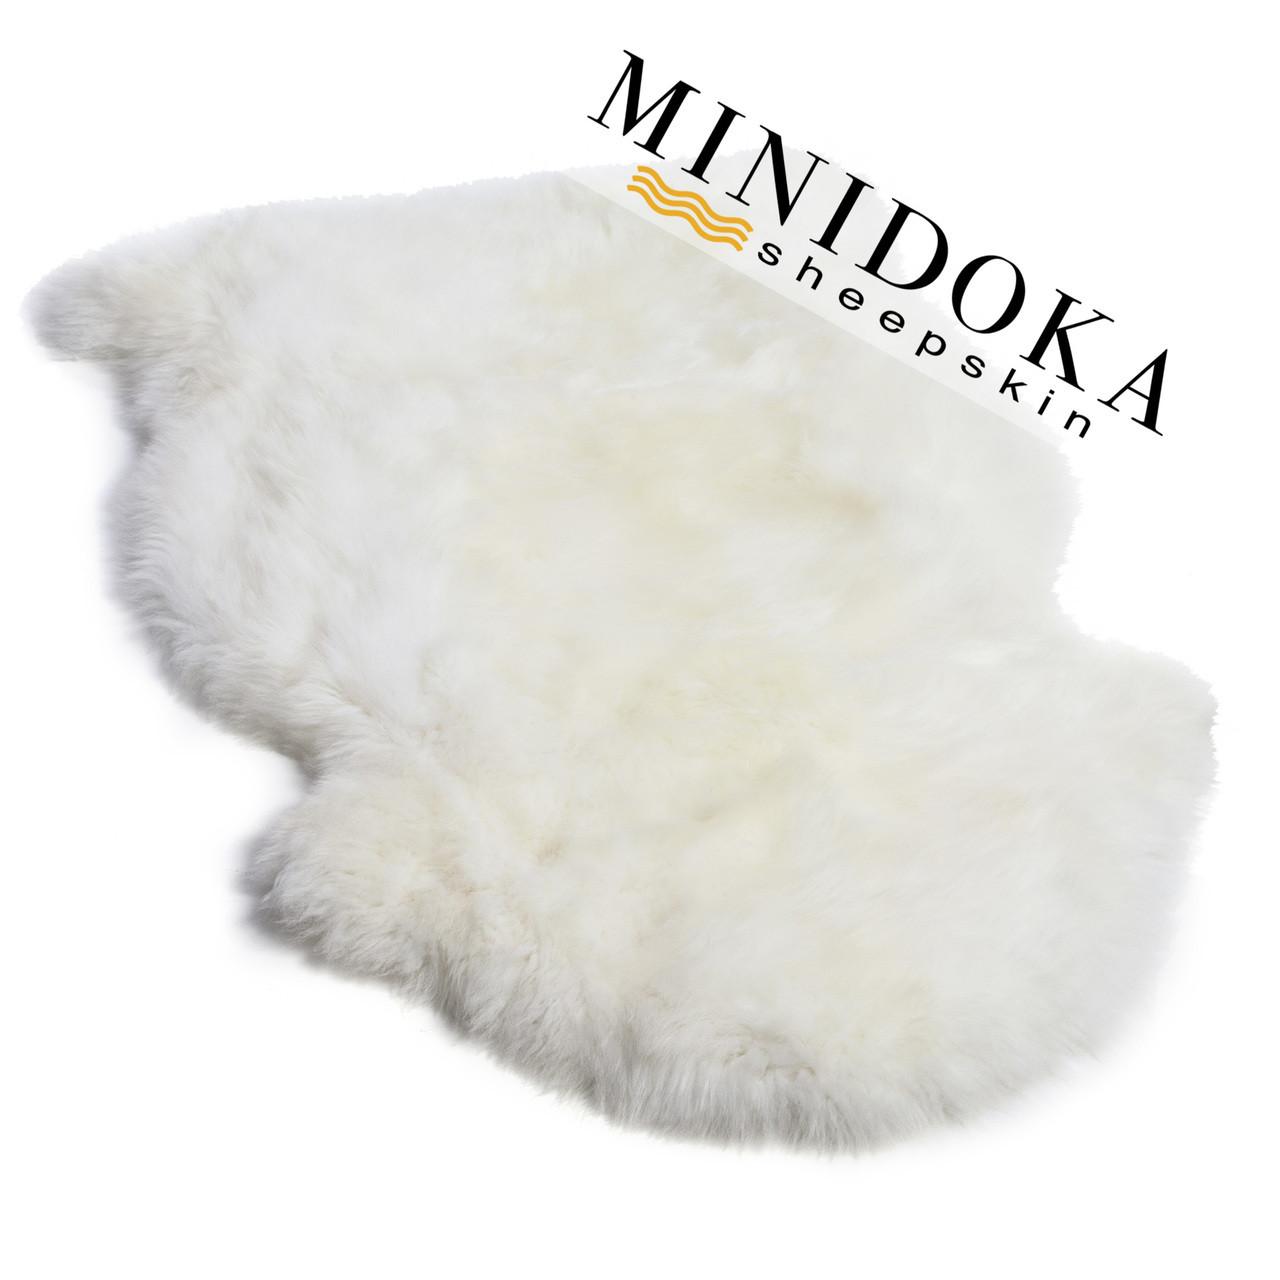 Single pelt ivory sheepskin rug premium grade from Minidoka Sheepskin